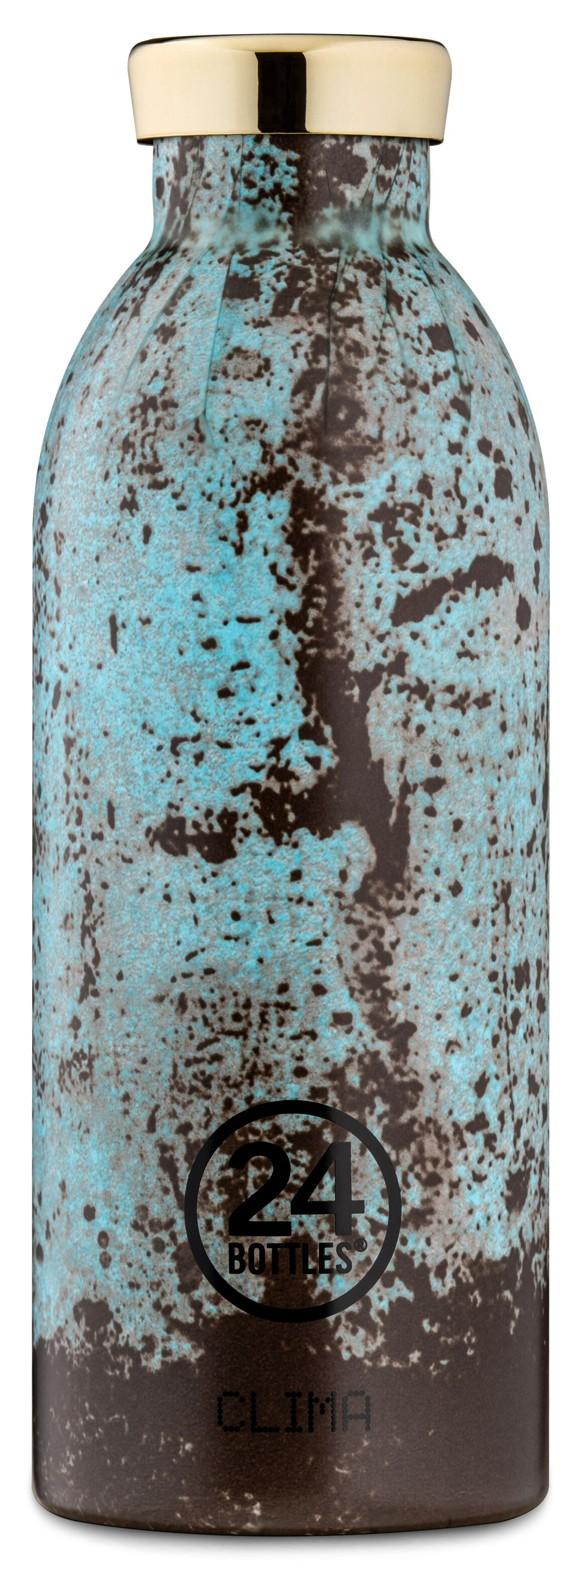 24 Bottles - Urban Bottle 0,5 L - Riace